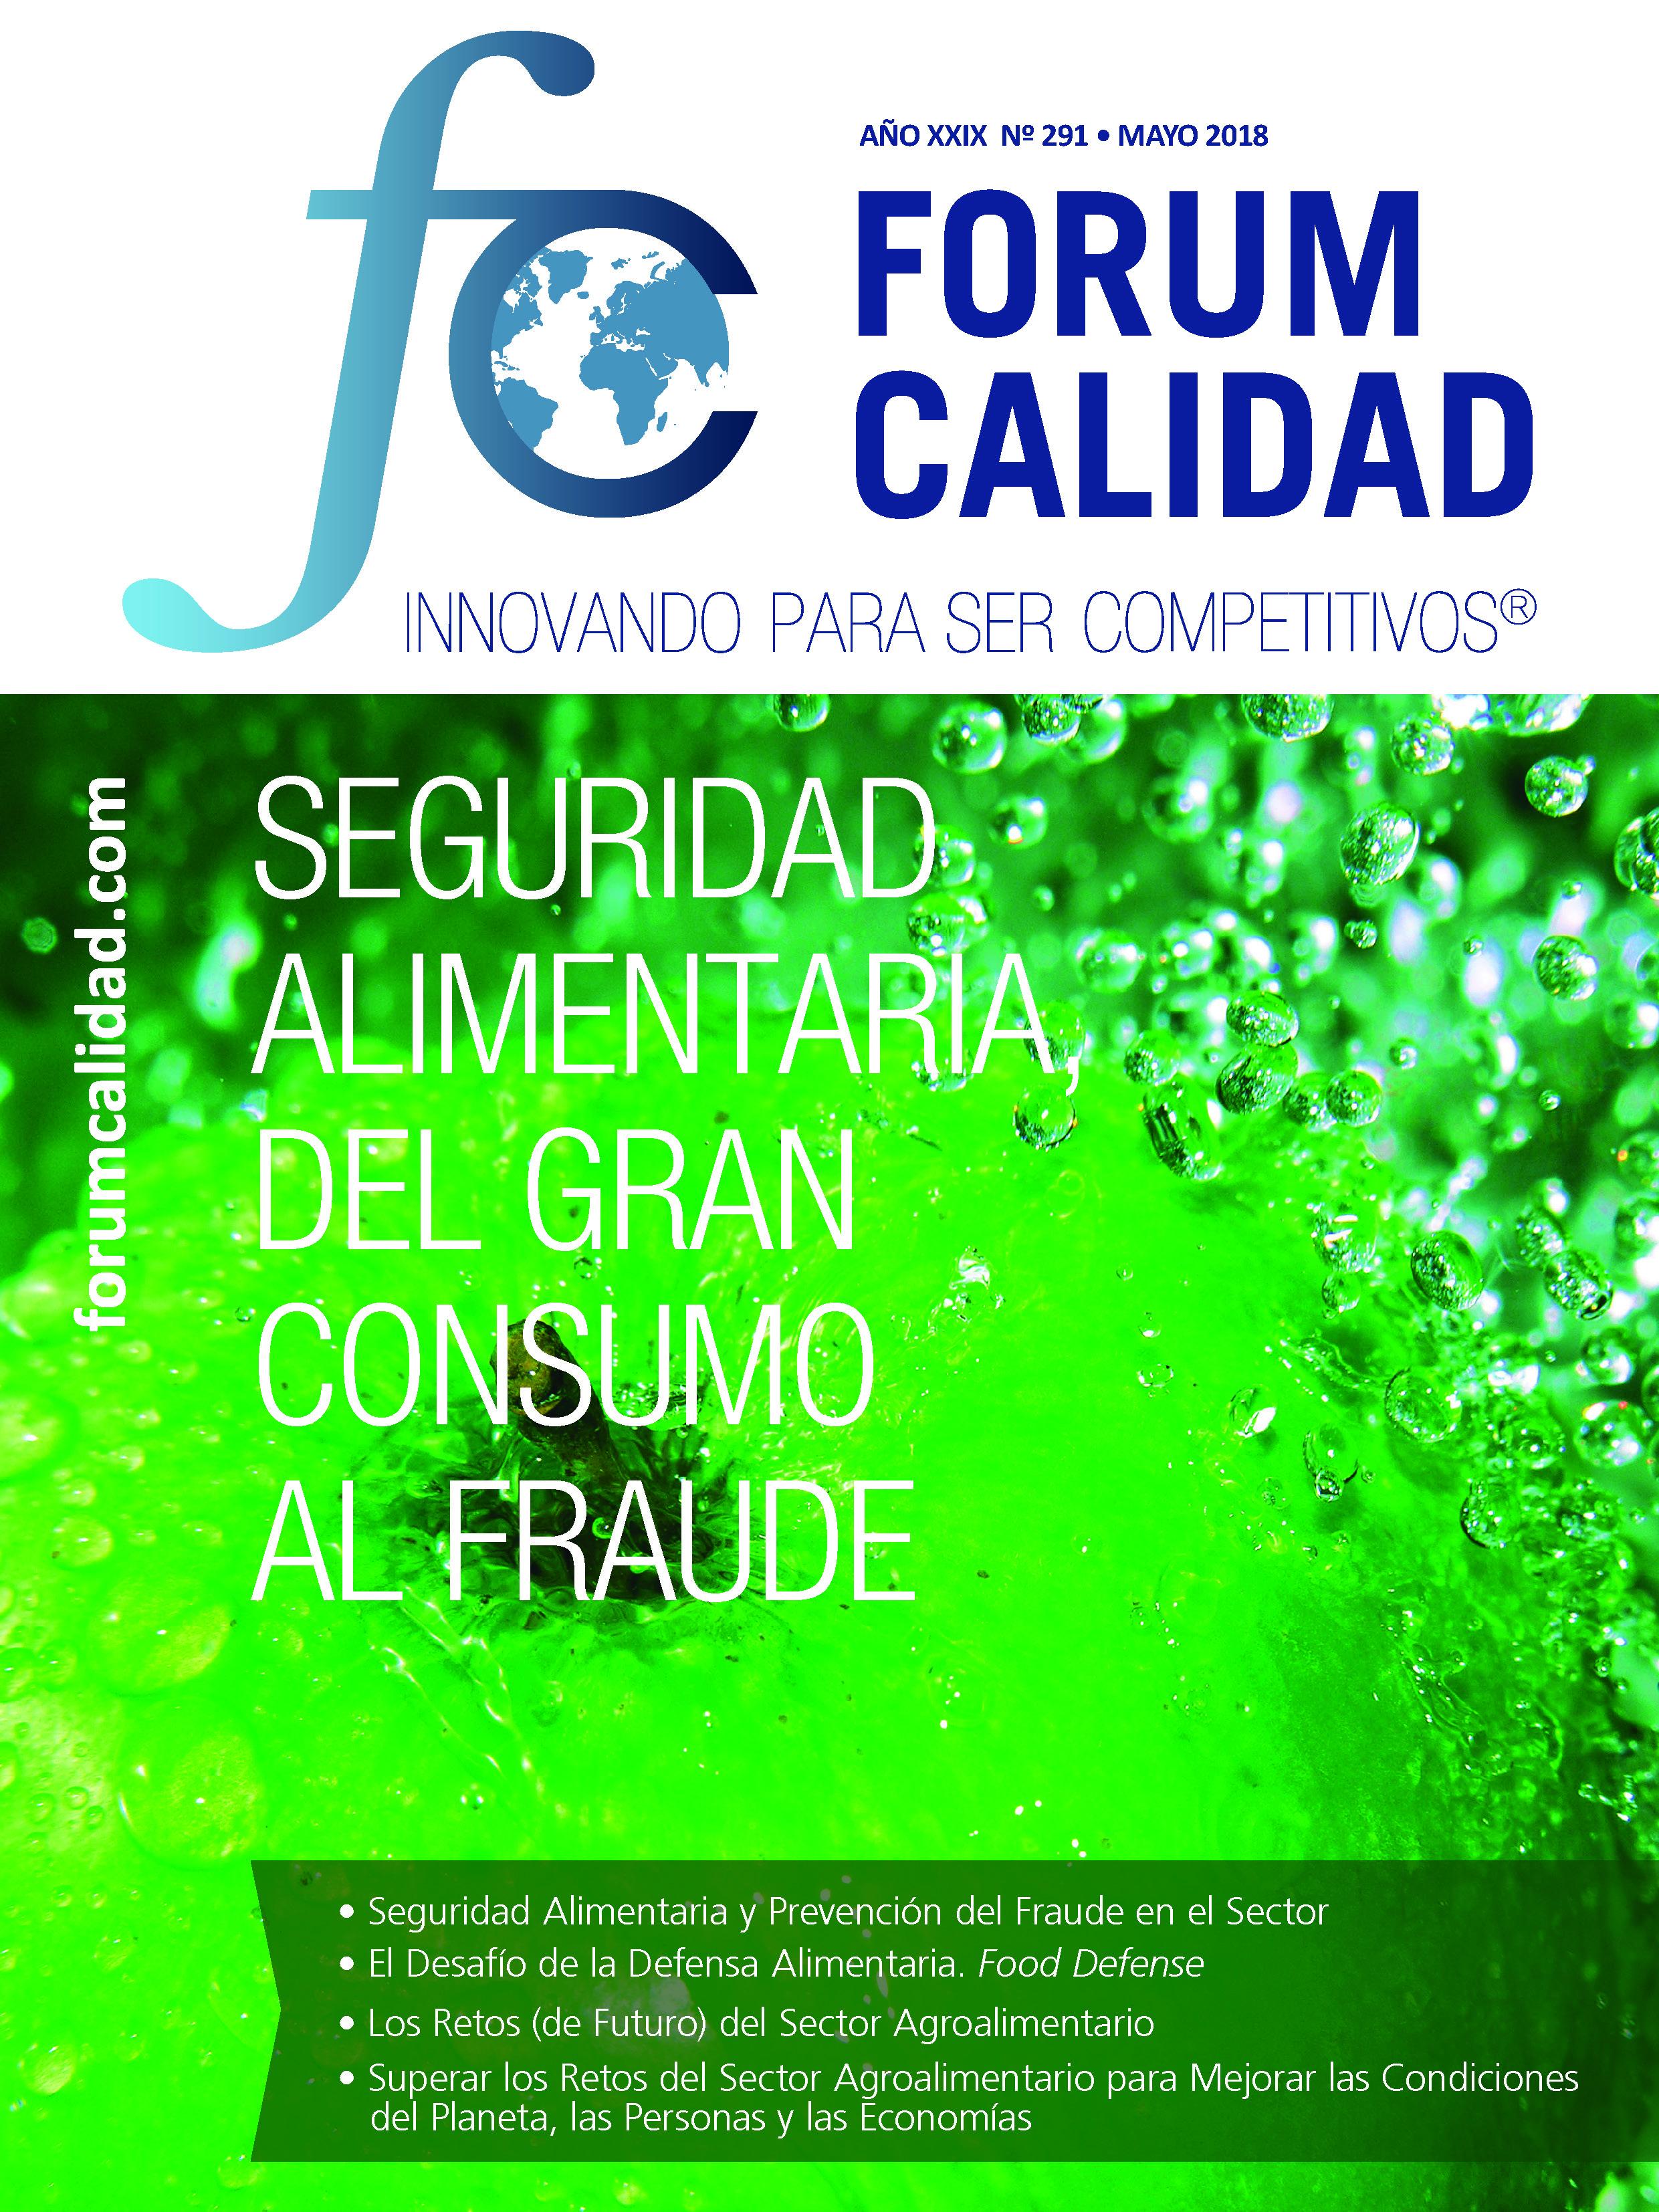 Forum Calidad nº 291 Mayo 2018